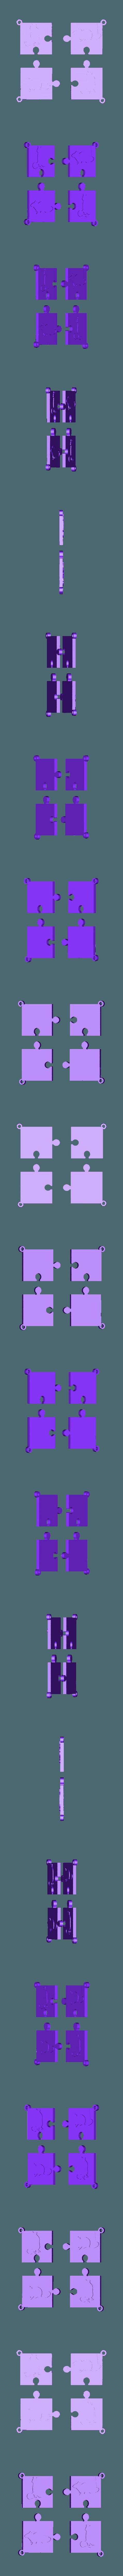 puzzle souris.stl Download STL file puzzle key ring • 3D printing design, catf3d